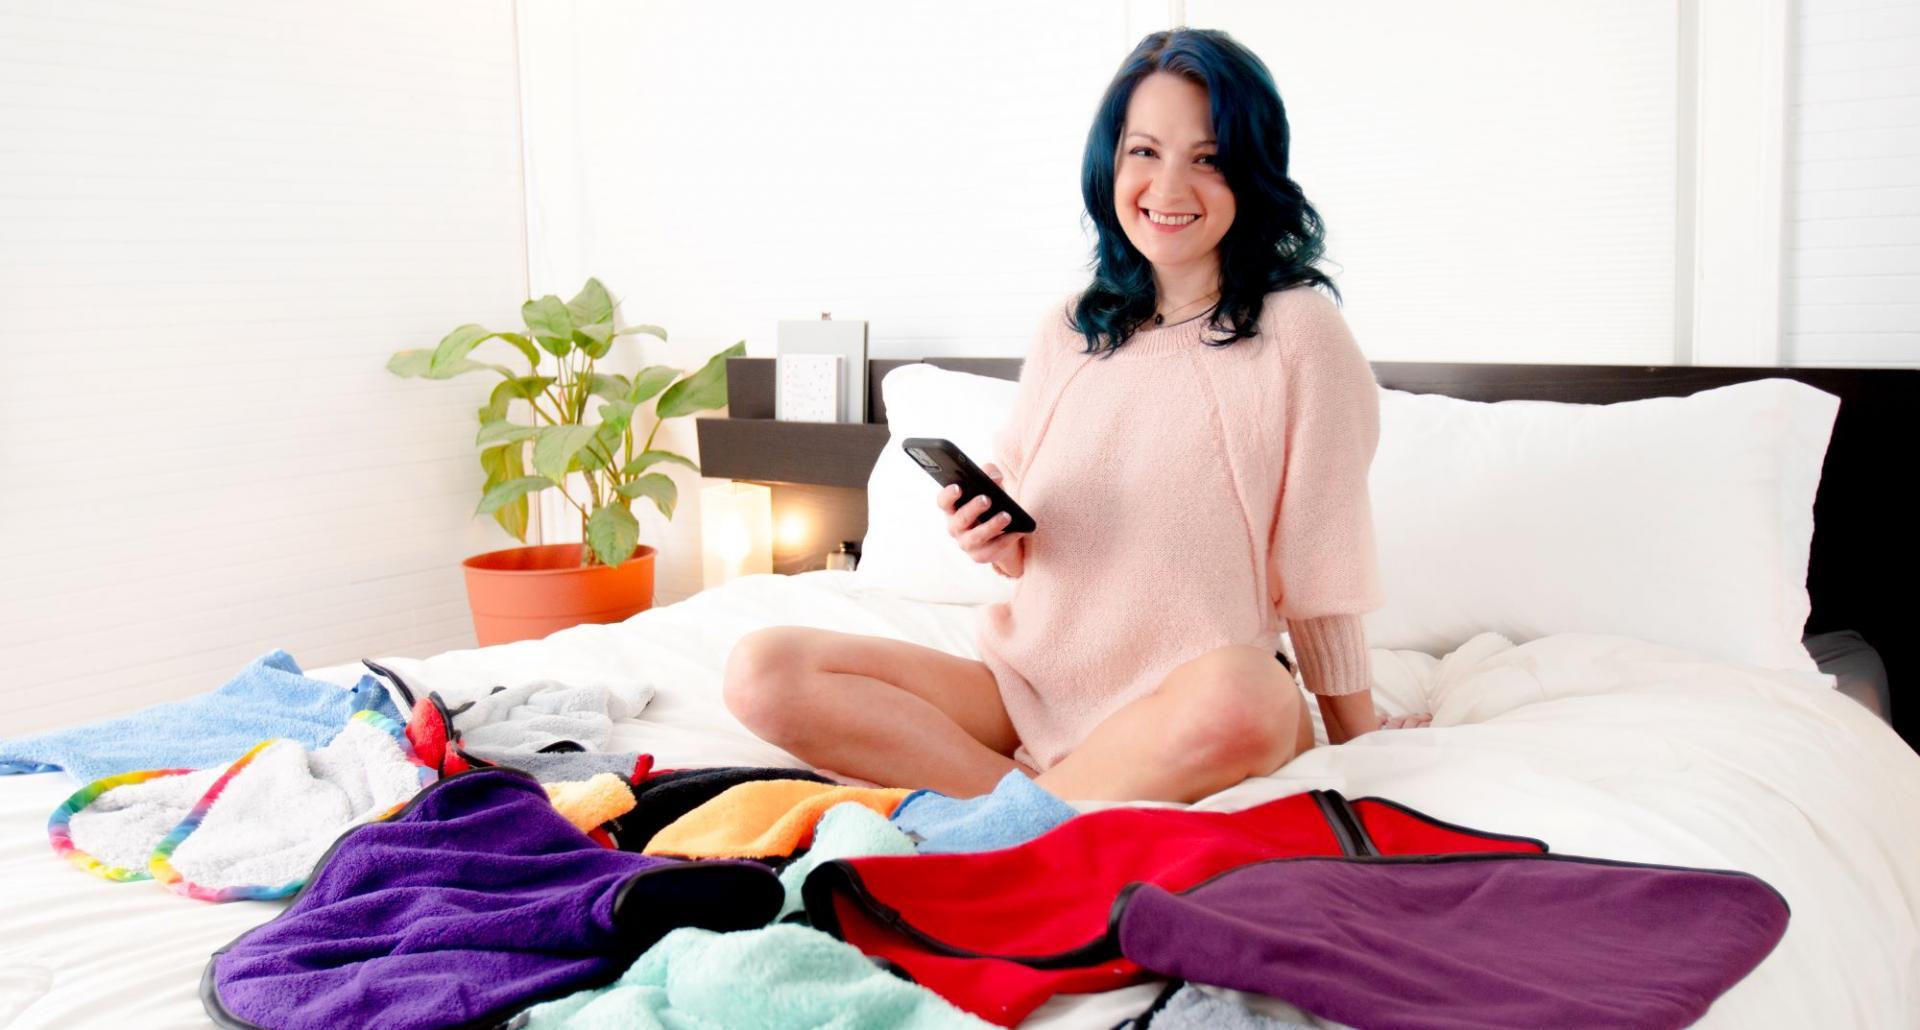 AnnaRae Luxury Sex Towels